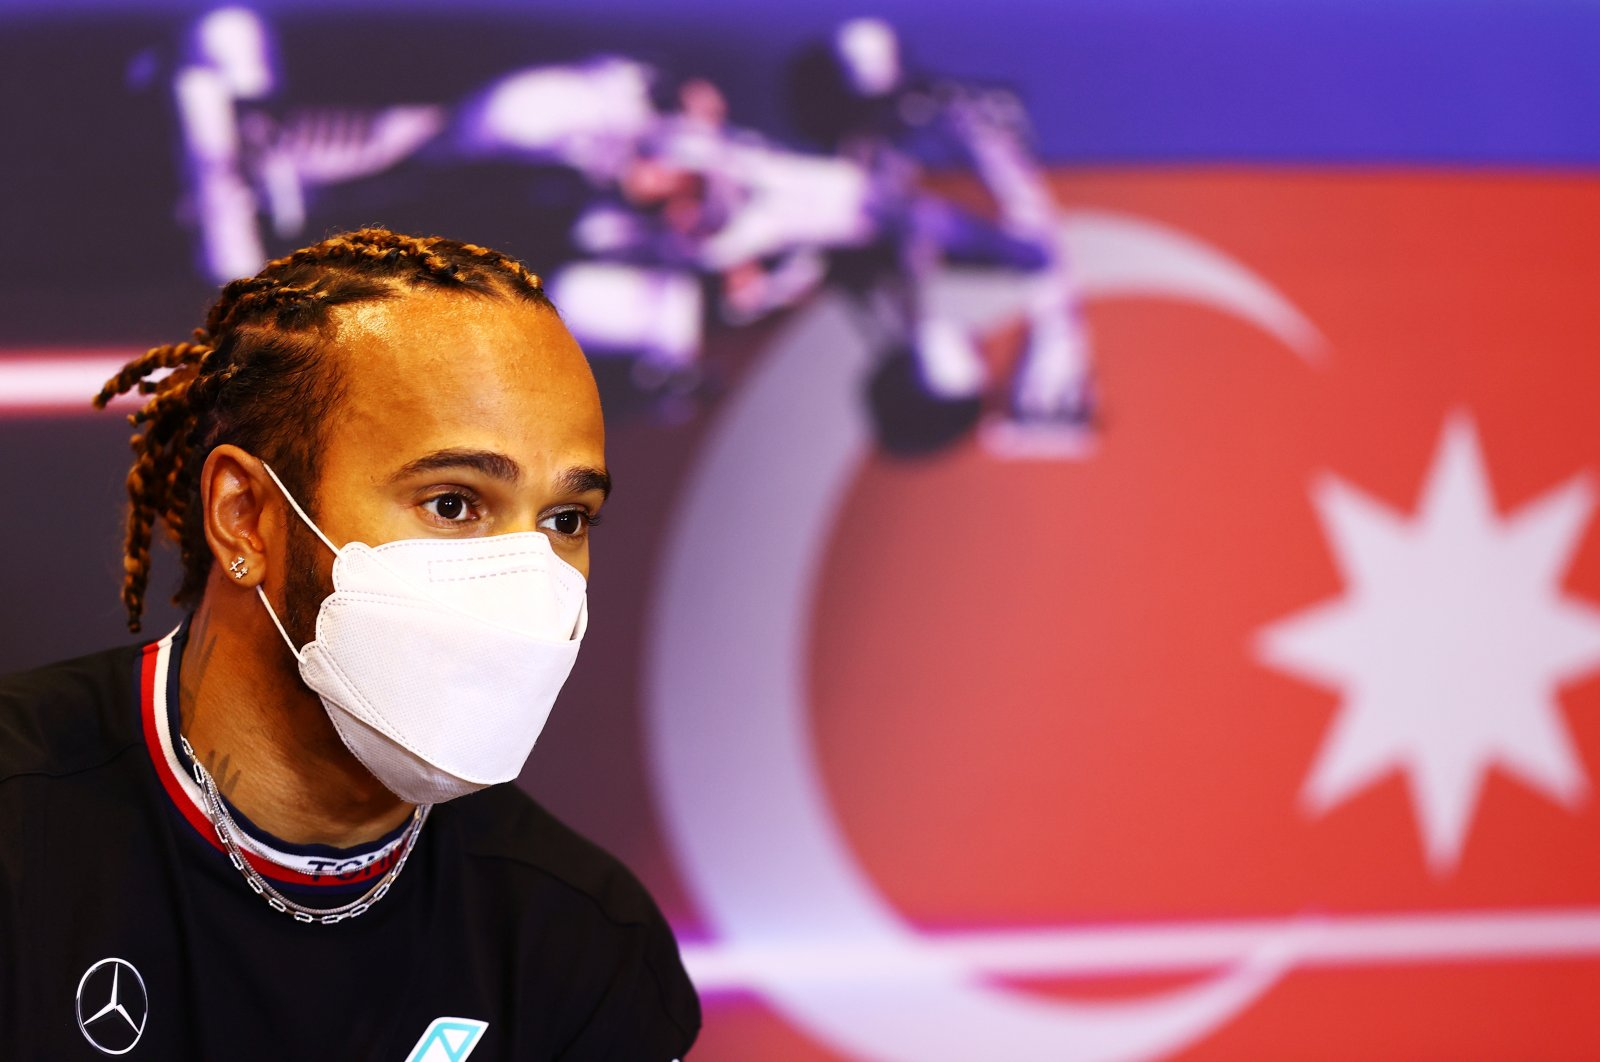 Mercedes' Lewis Hamilton during a press conference ahead of the Formula One Azerbaijan Grand Prix, Baku, Azerbaijan, June 3, 2021. (Reuters Photo)